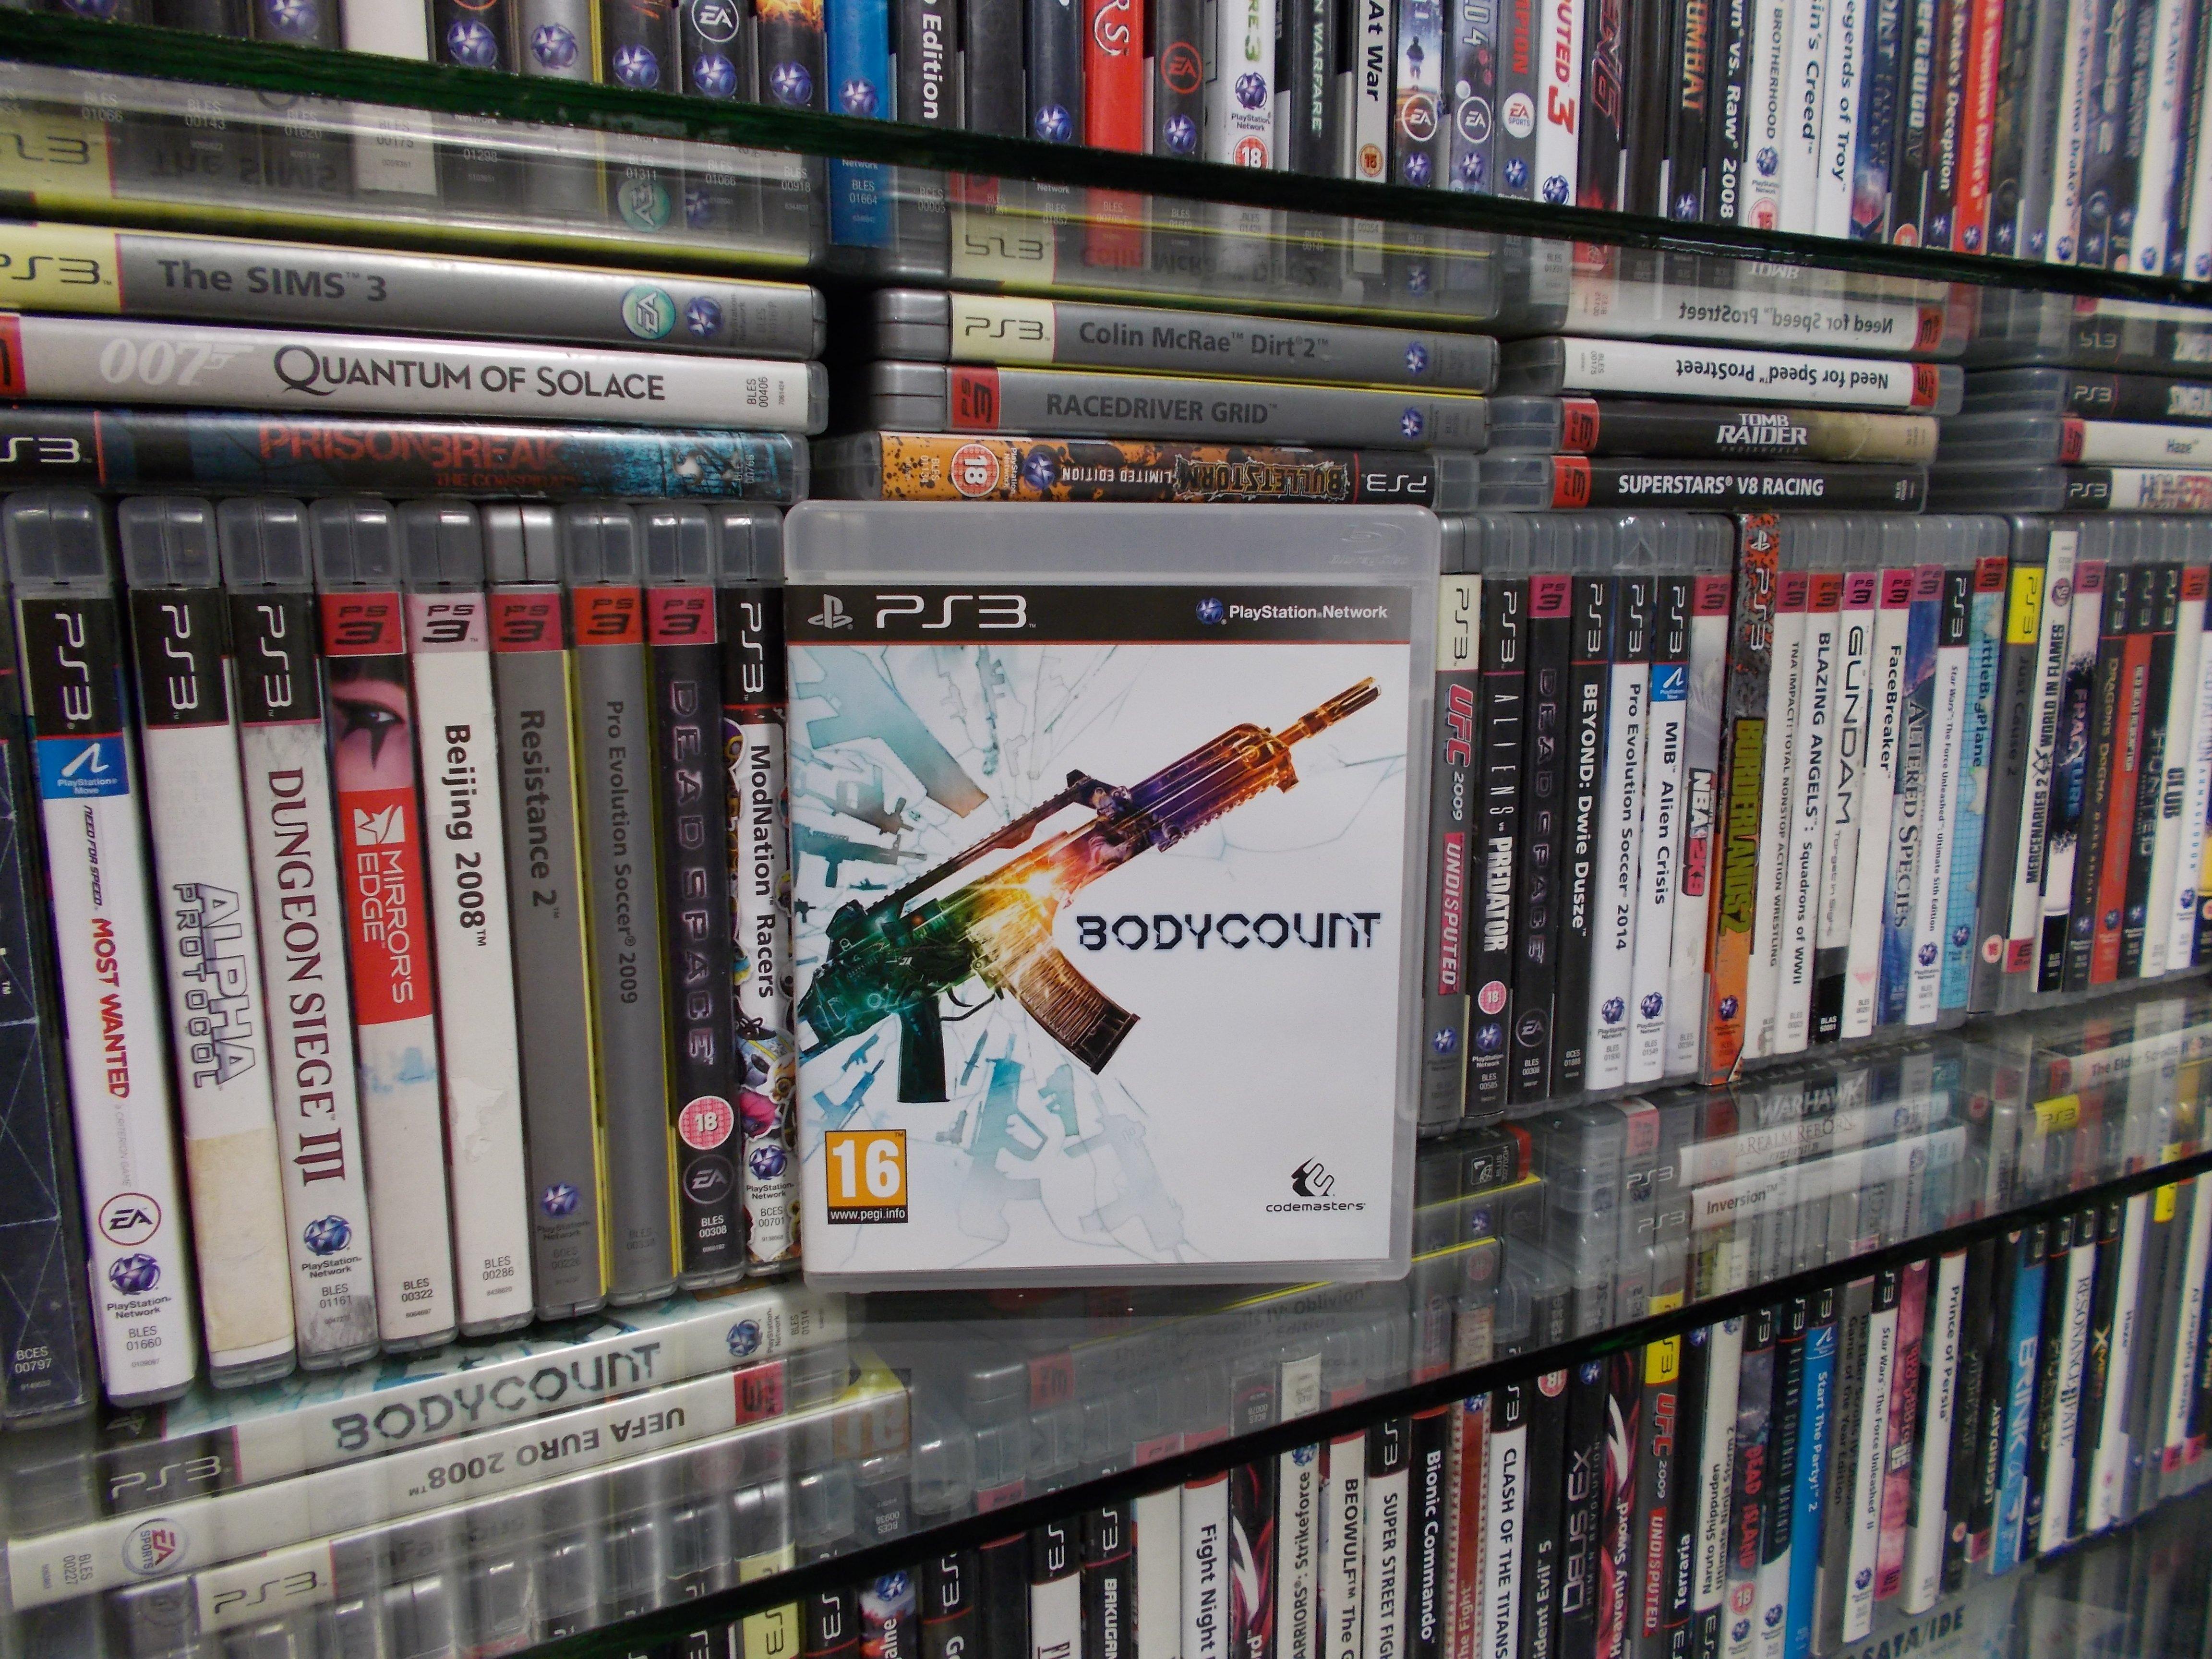 Bodycount - GRA PS3 Sklep